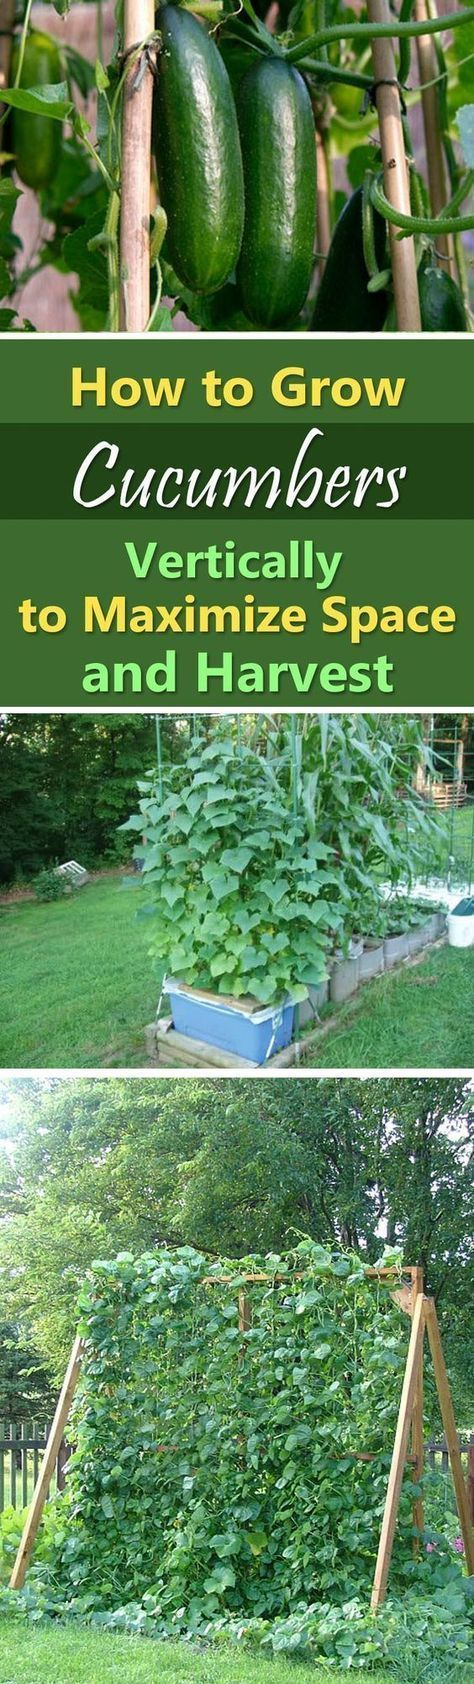 Growing Cucumbers Vertically | How to Grow Cucumbers in Small Garden #greenhousegardening